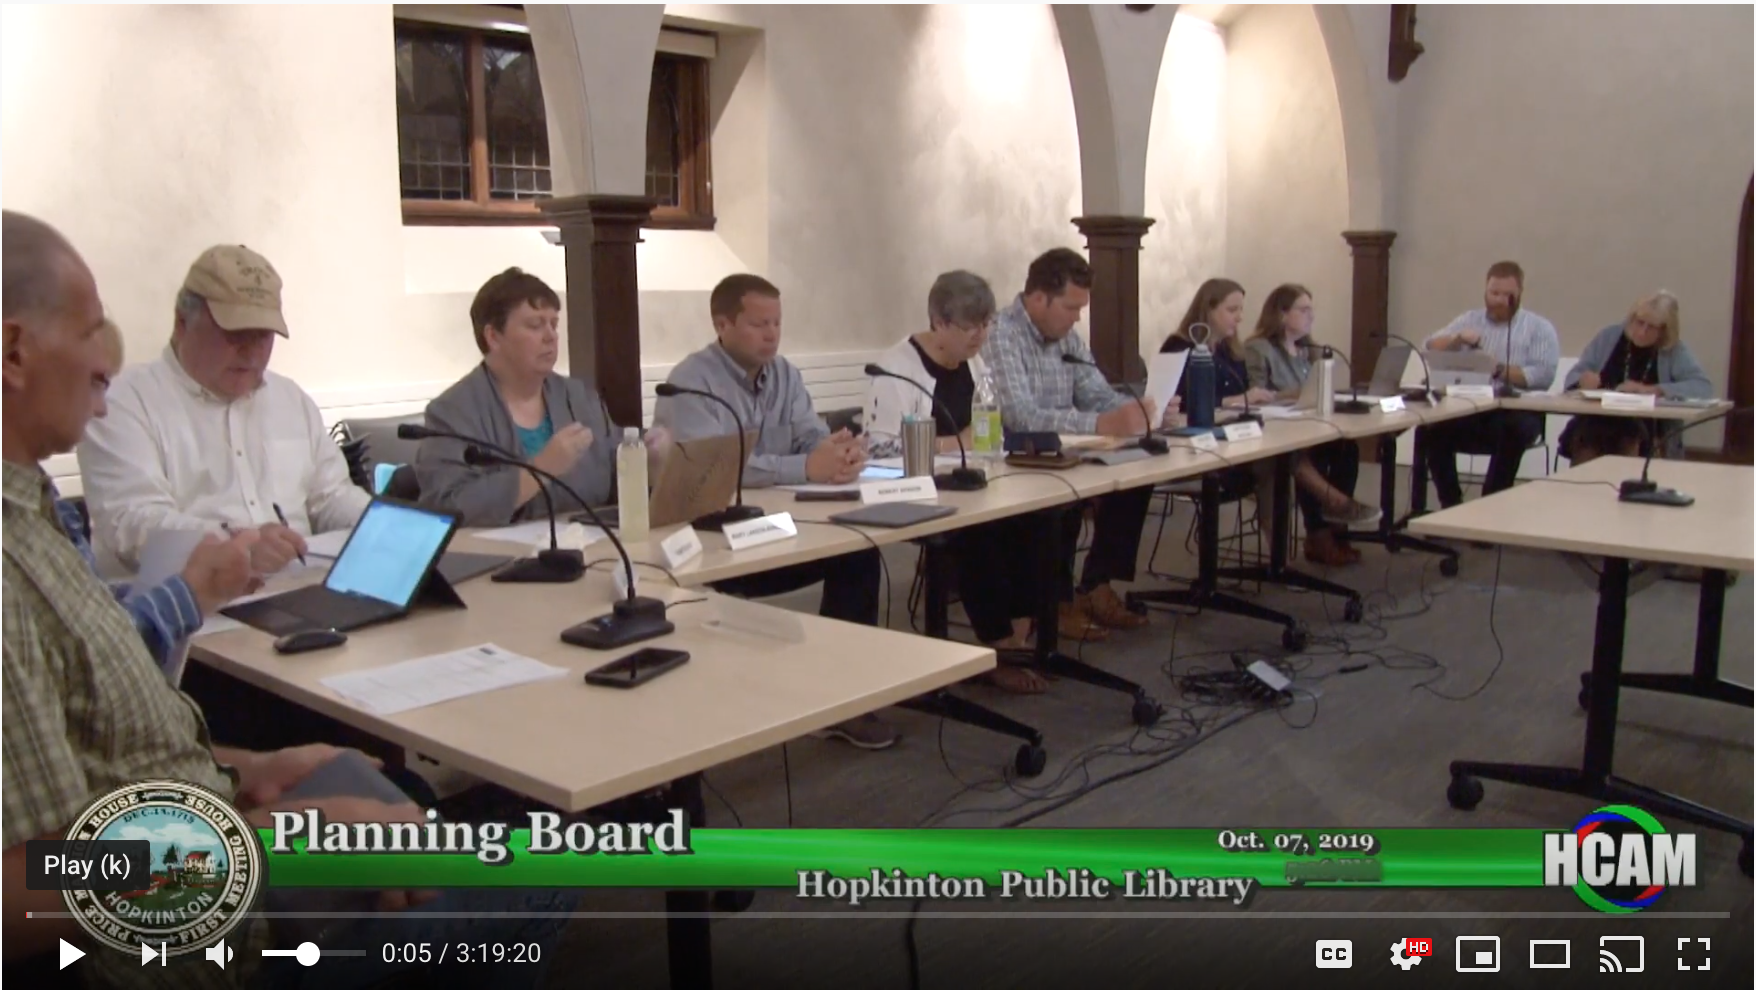 Planning Board Actions Taken 10/7/19